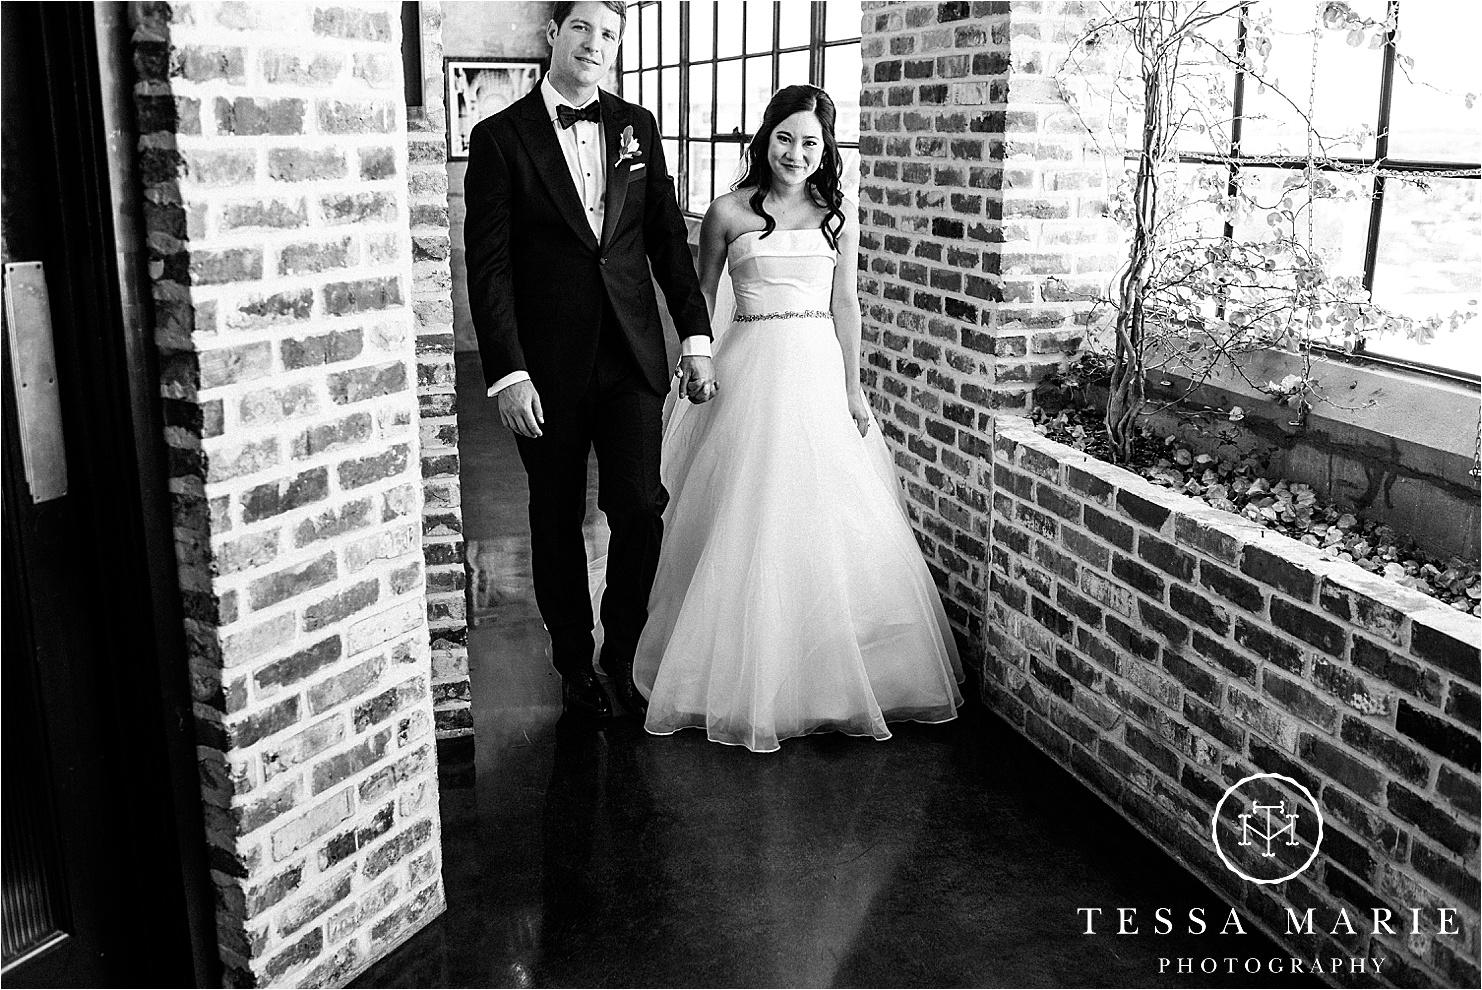 Tessa_marie_weddings_houston_wedding_photographer_The_astorian_0062.jpg